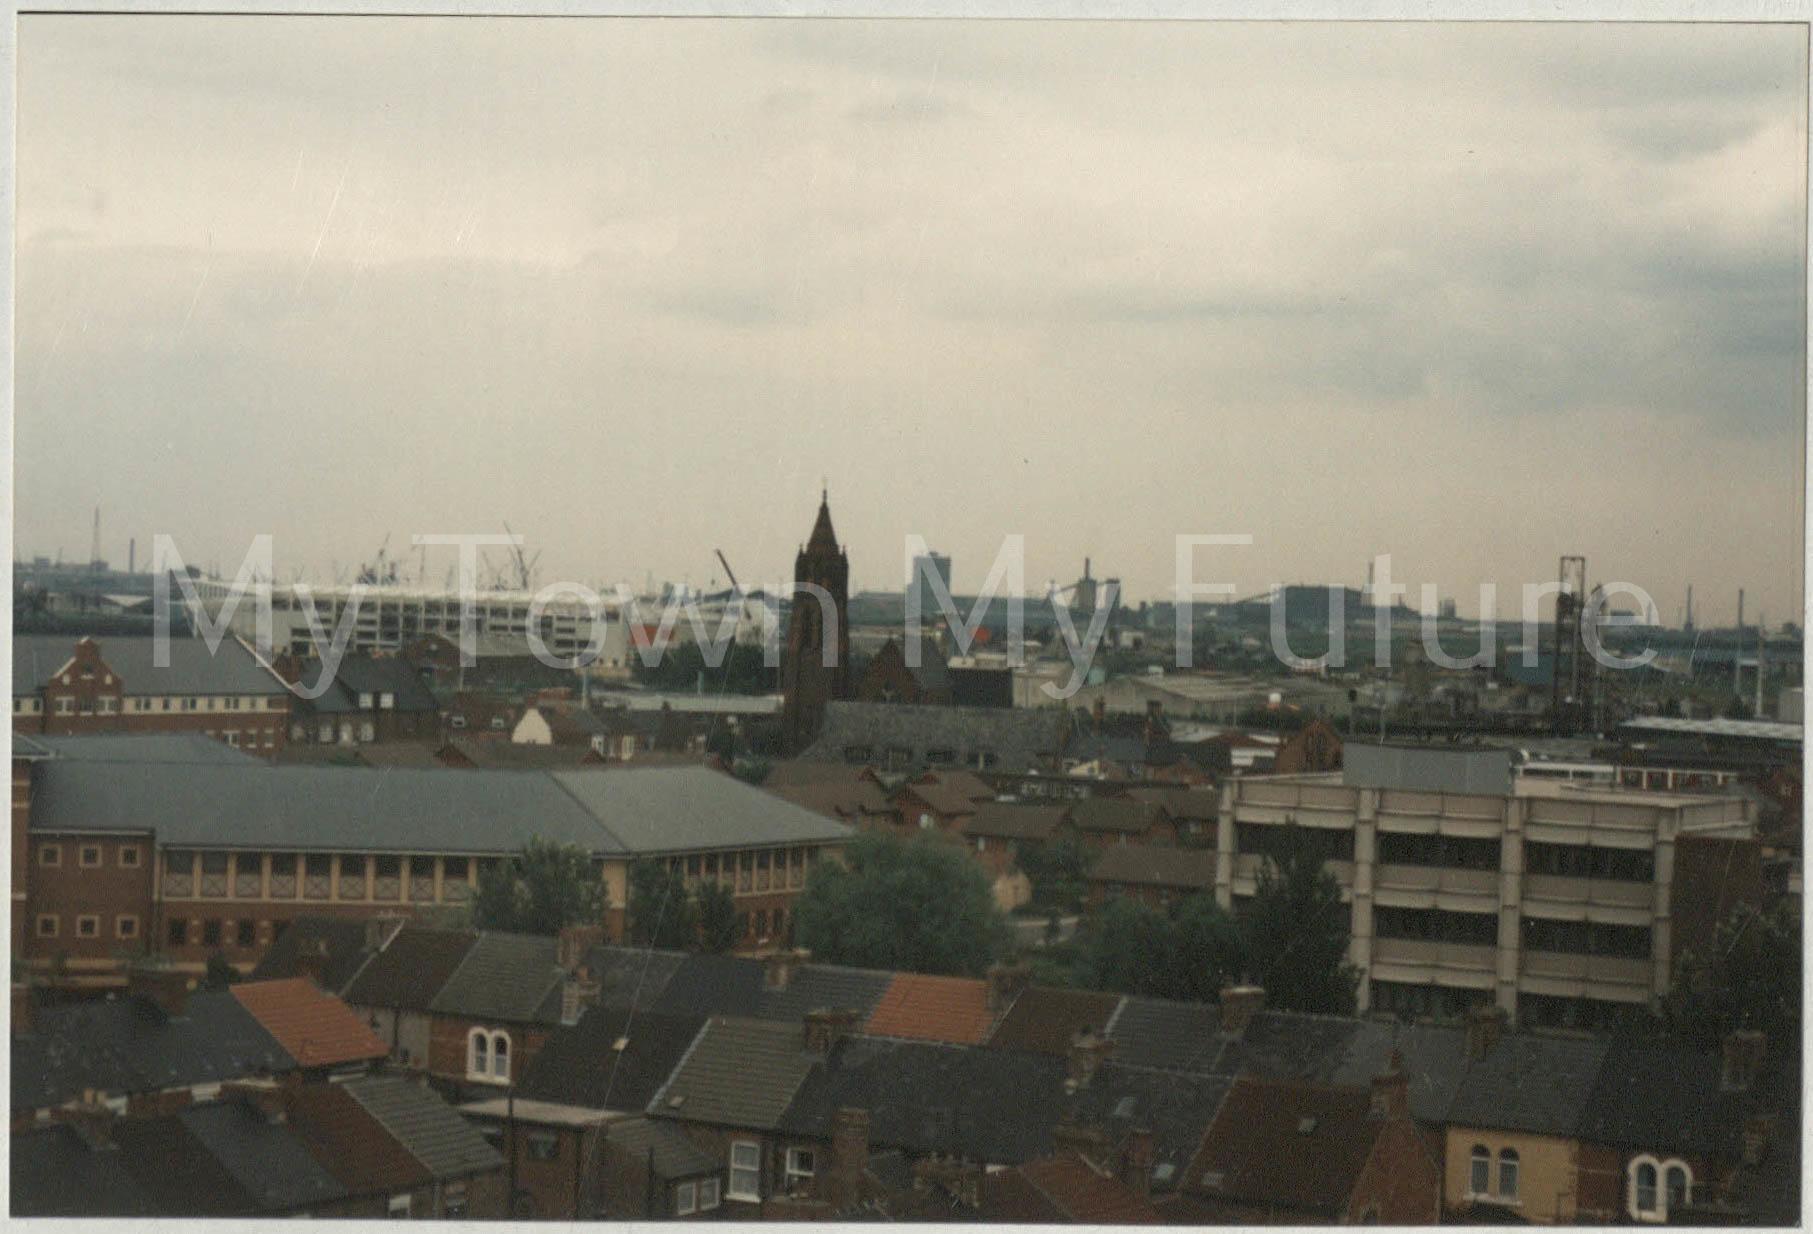 Middlesbrough Town Centre, 1995, Paul Stephenson